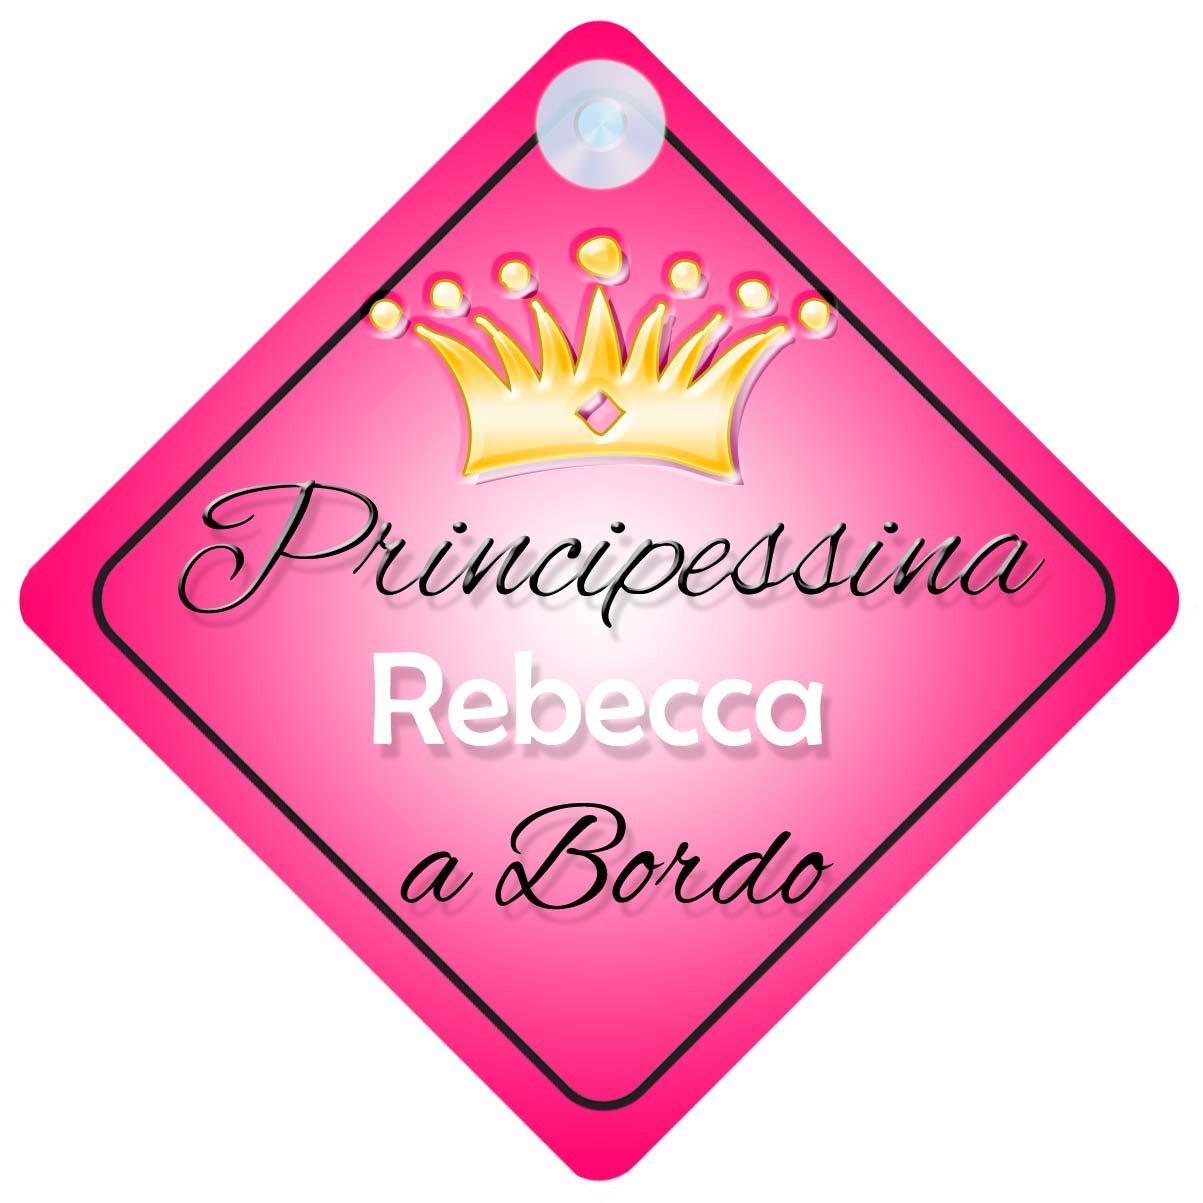 Principessina Rebecca (001) adesivo bimbo / bambina / neonato a bordo per femmina adesivo macchina, bimbi, bambini, famiglia mybabyonboard UK